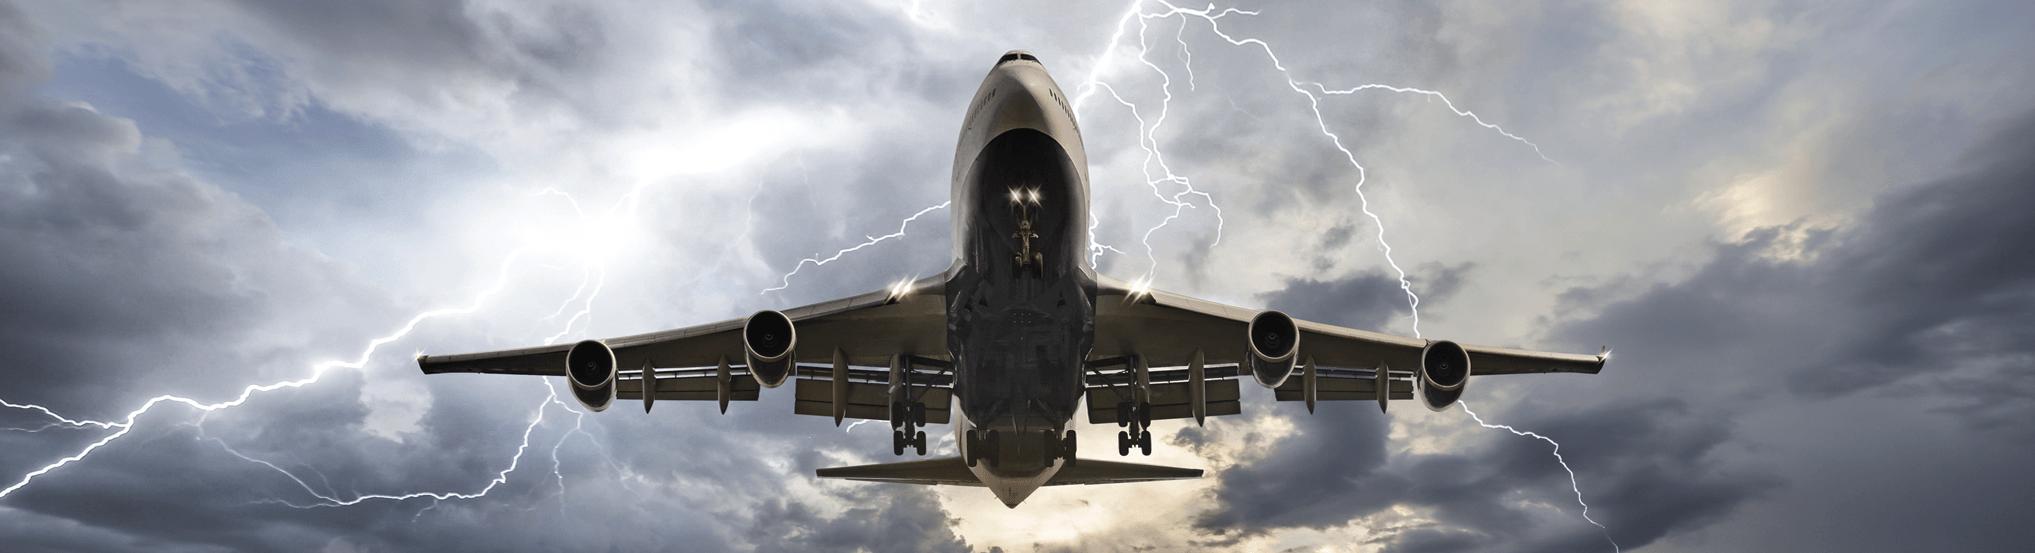 lightning simulation and modeling